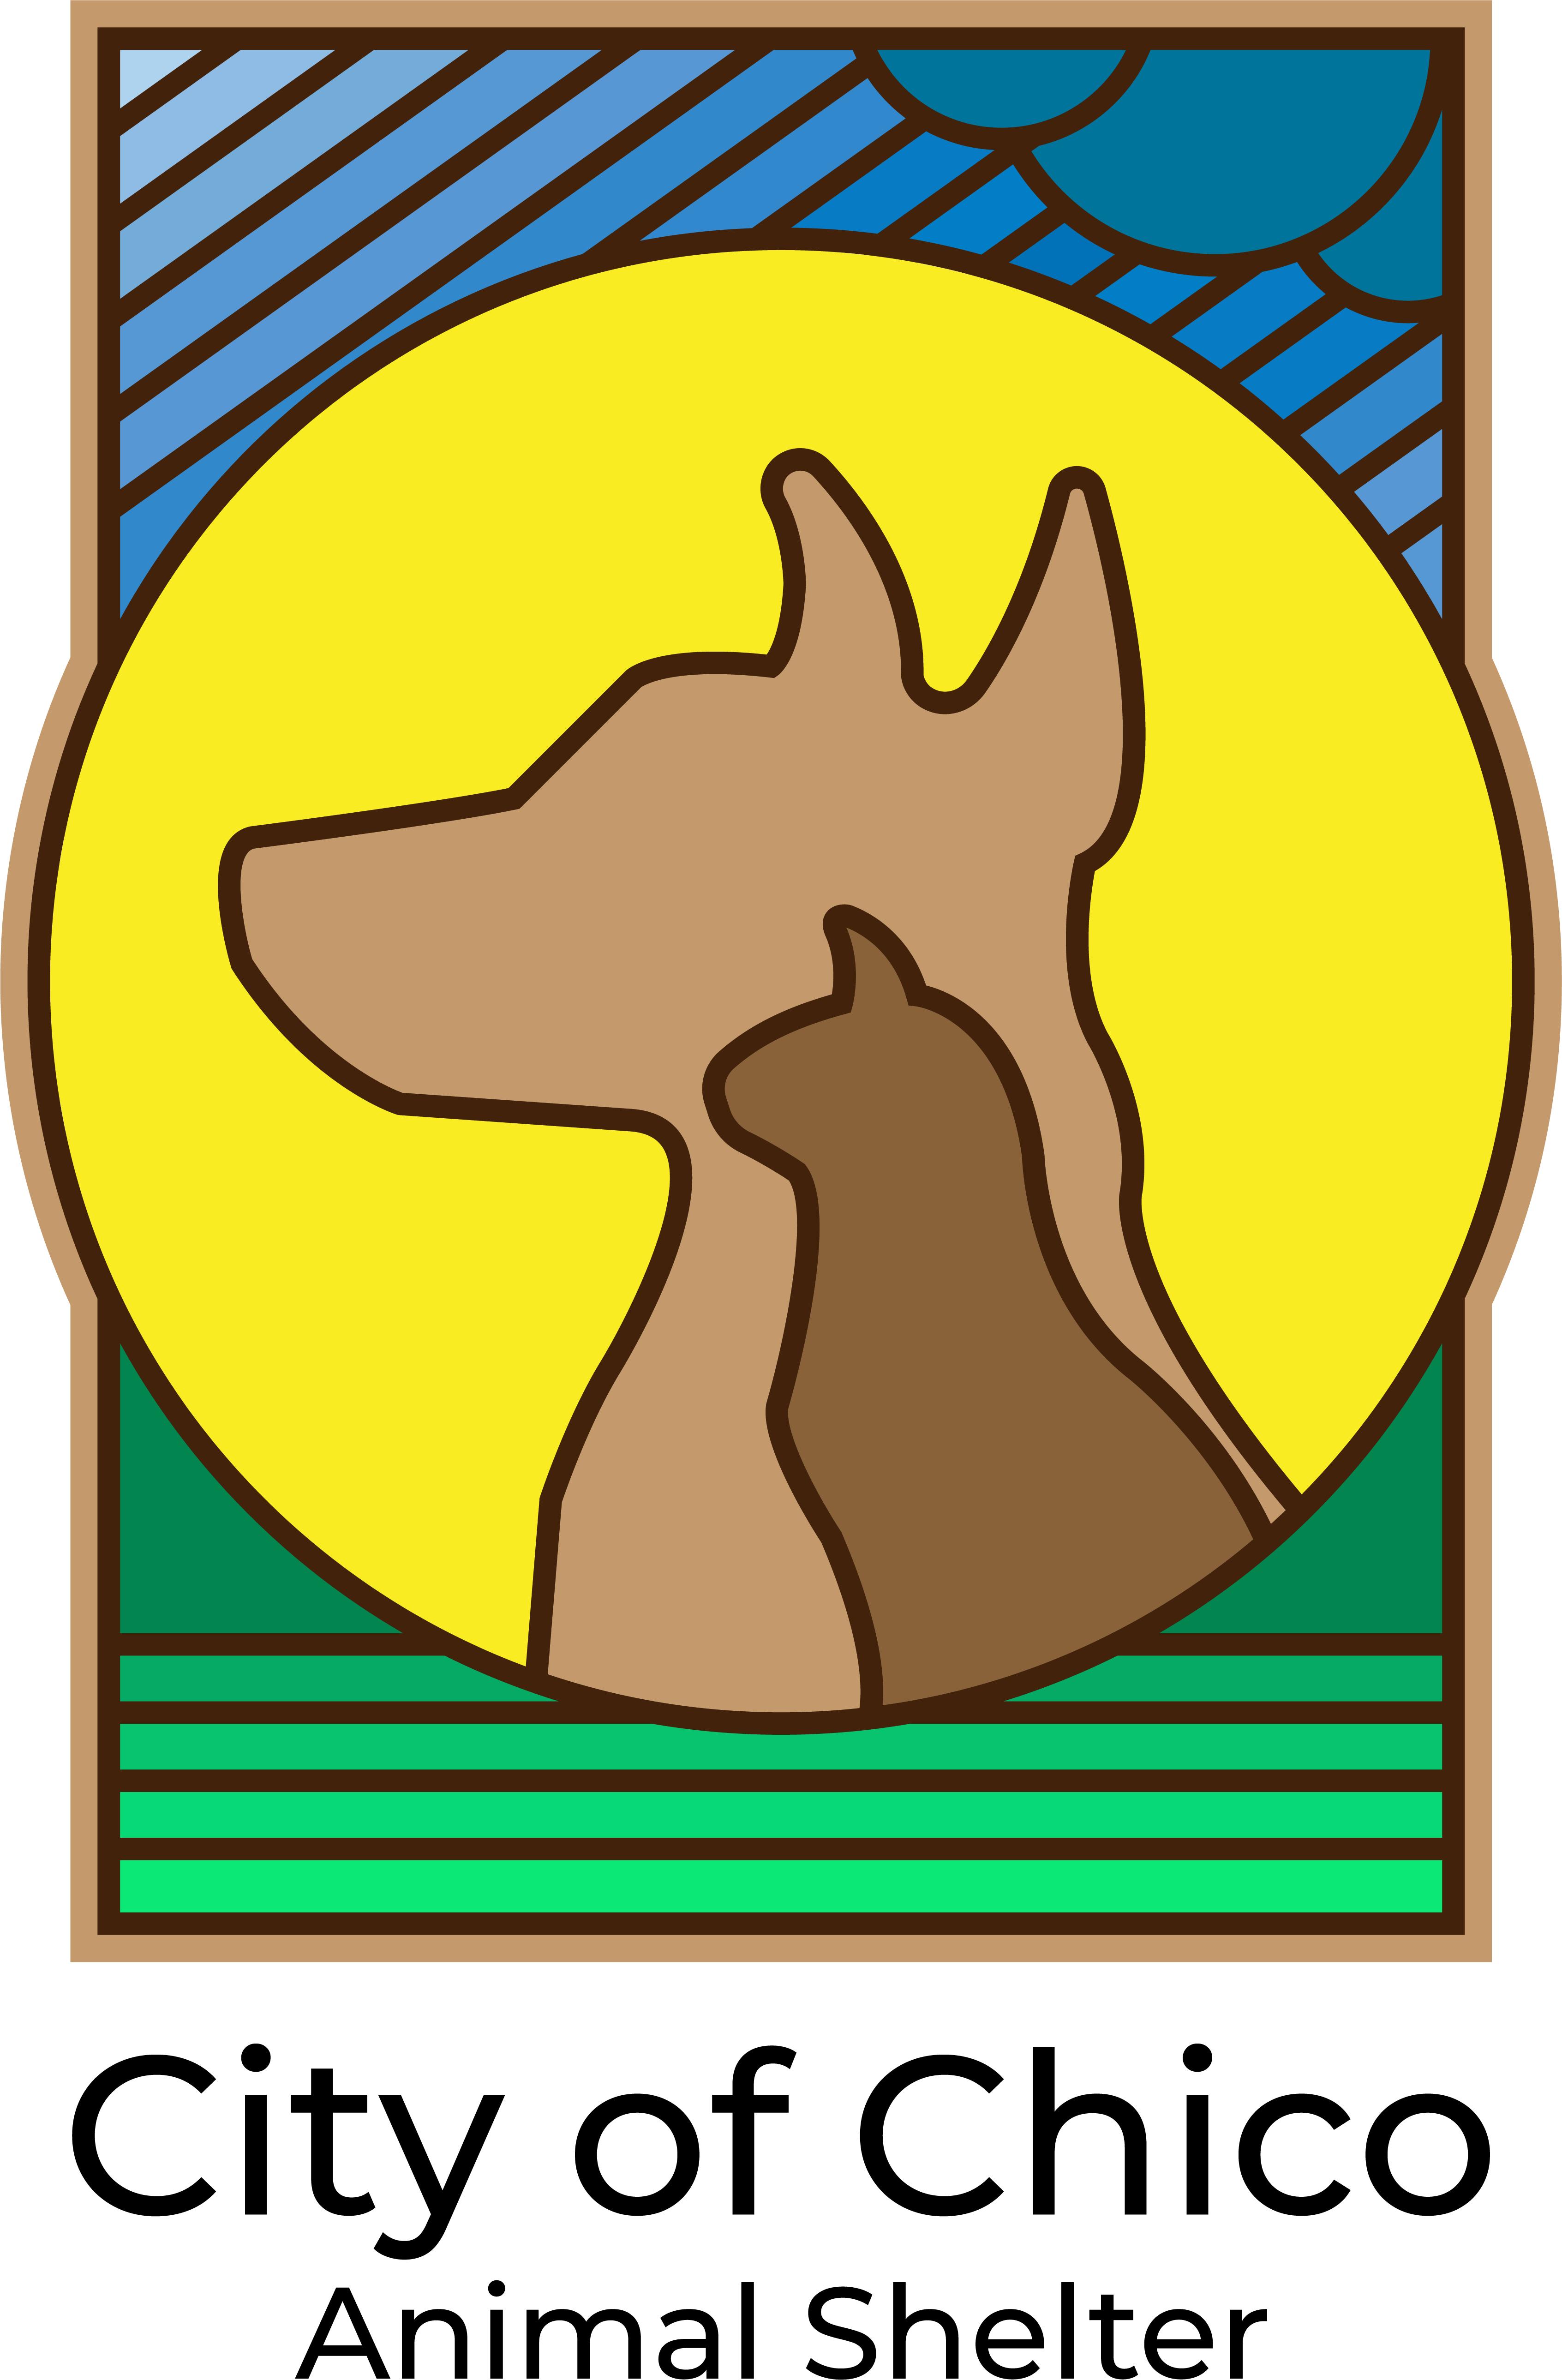 Chico Animal Shelter Internship Application Form